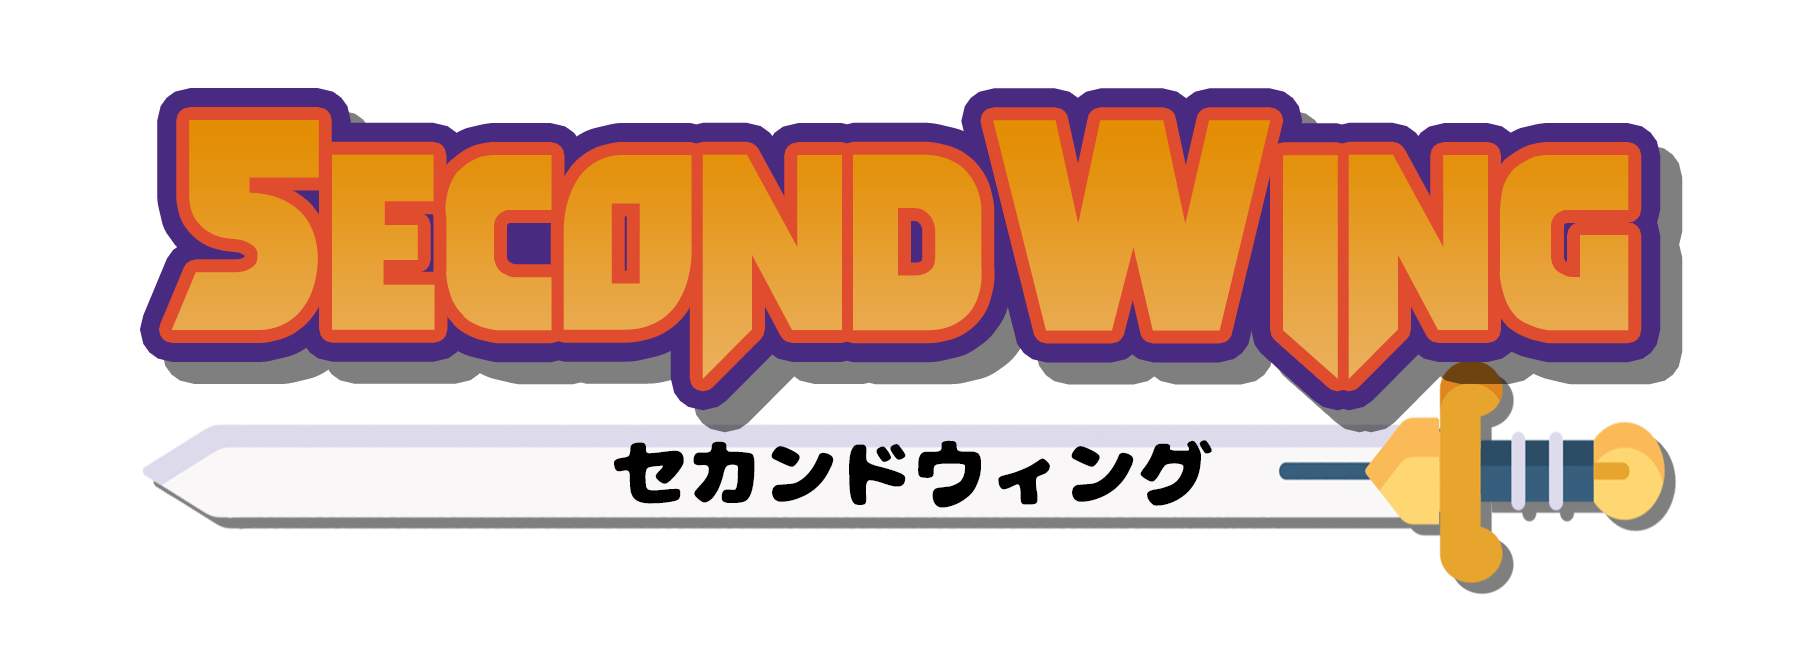 Second Wing: セカンドウィング